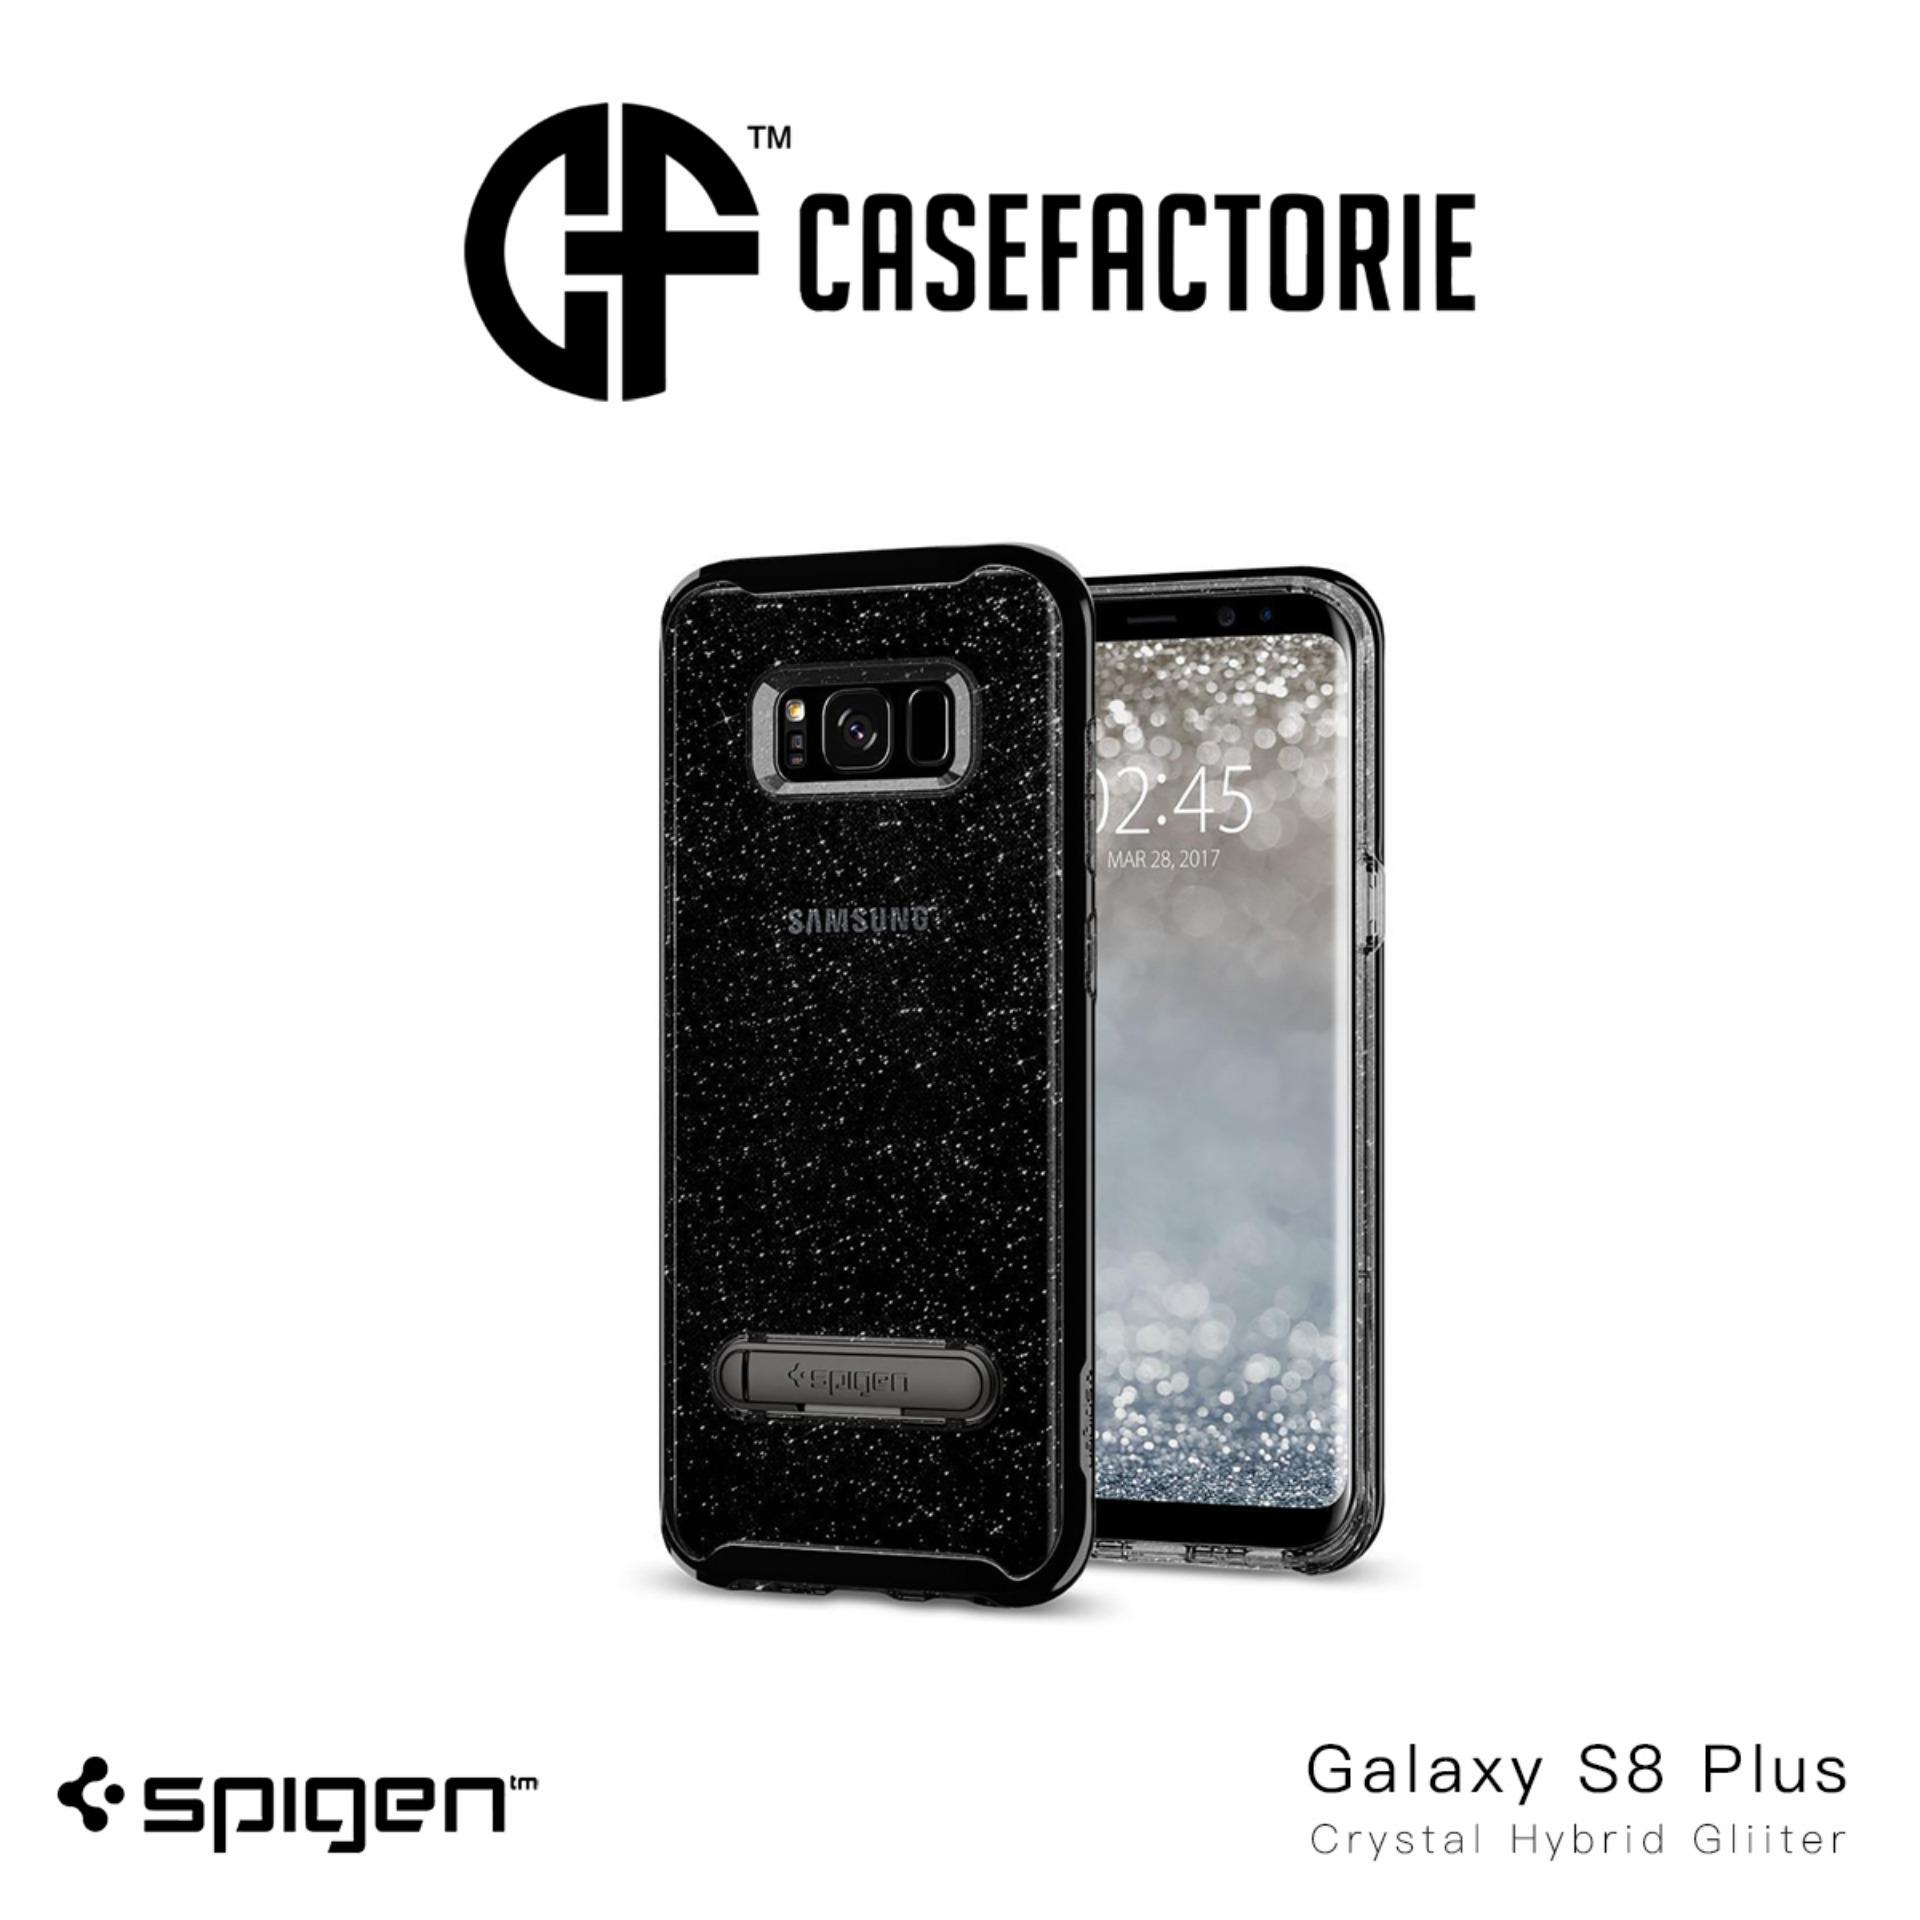 Spigen Crystal Hybrid Glitter Case For Samsung Galaxy S8 Plus Compare Prices